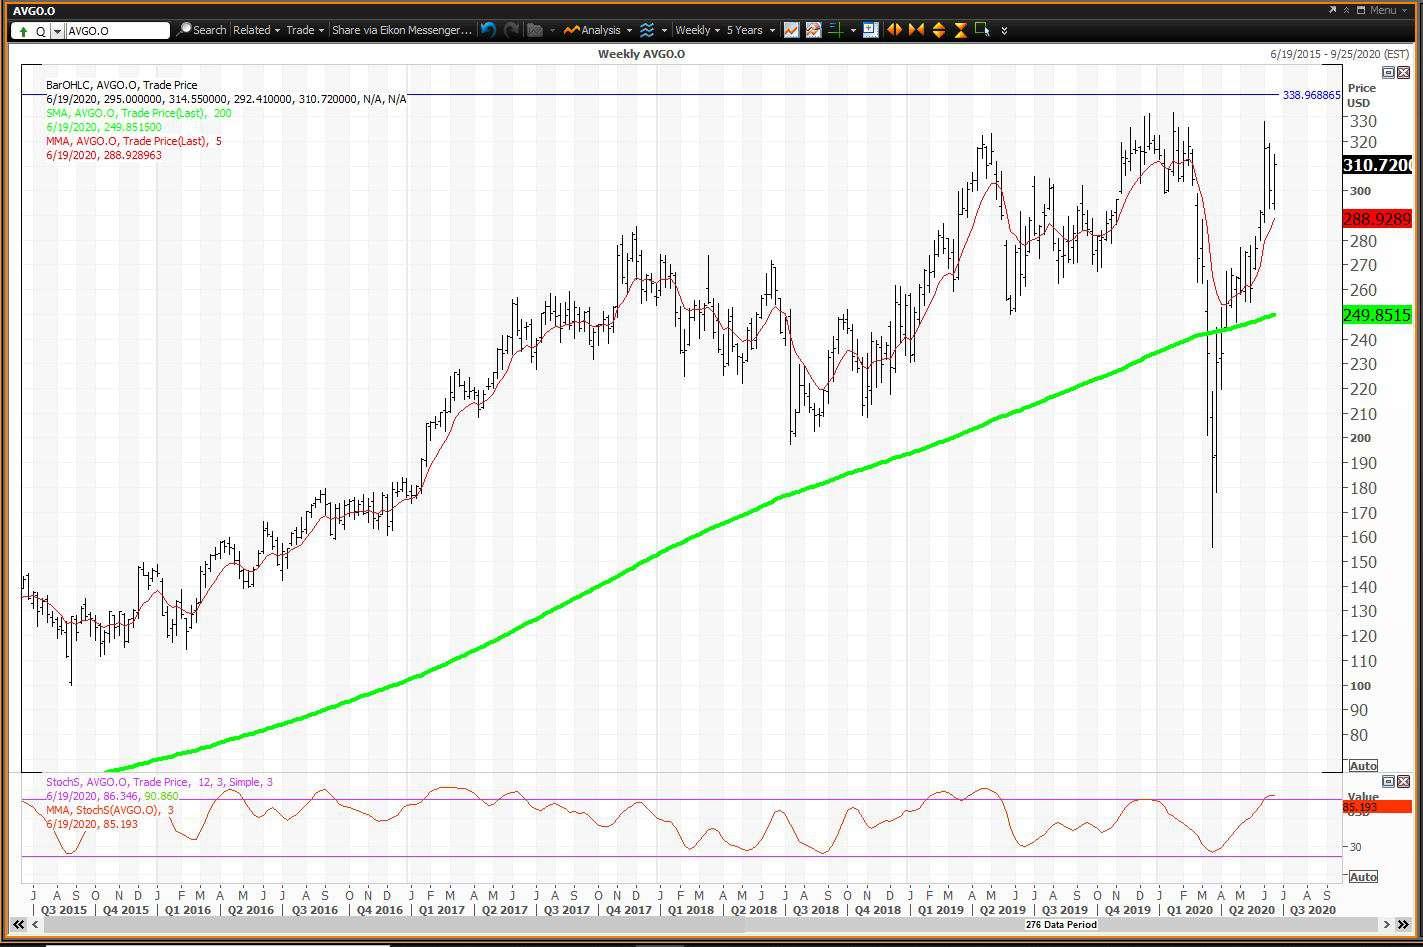 Weekly chart showing the share price performance of Broadcom Inc. (AVGO)